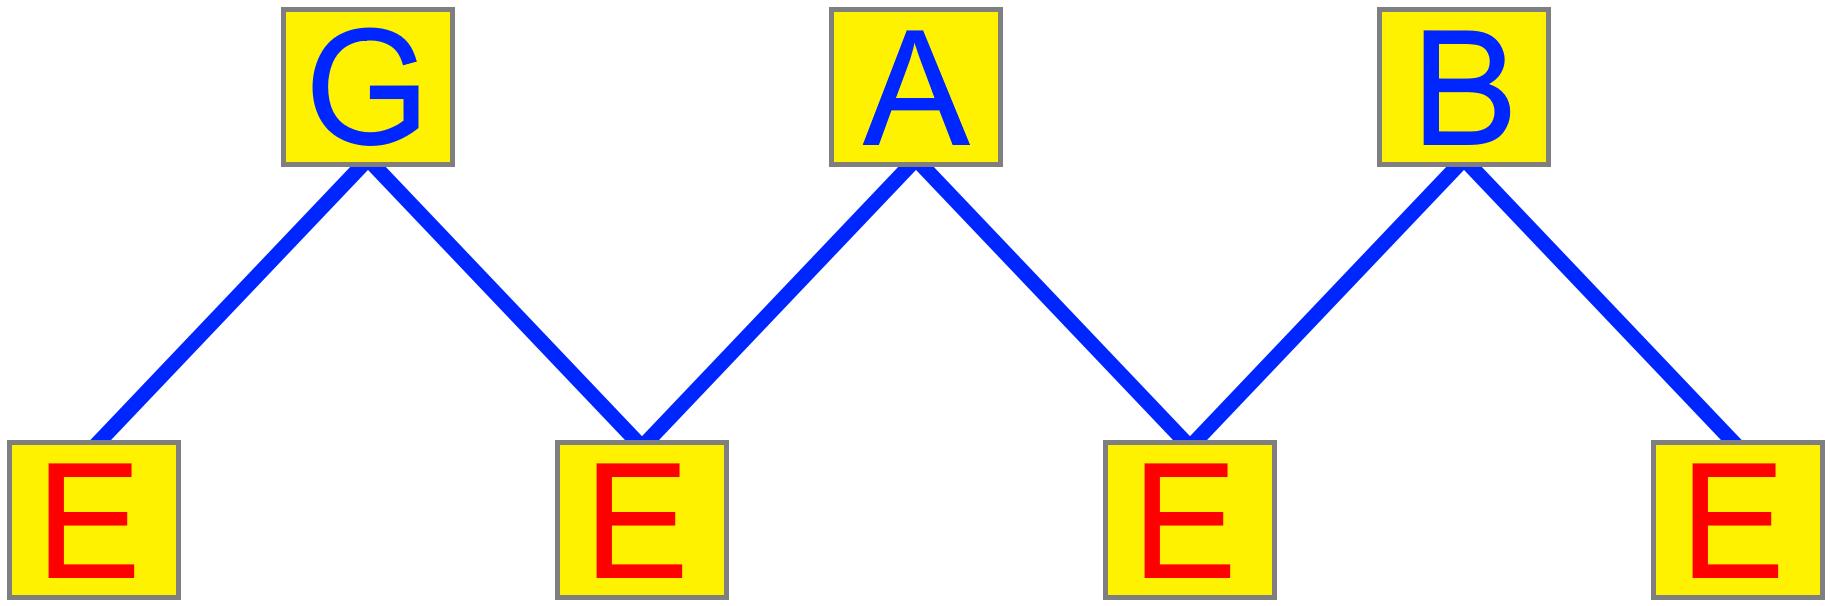 E pedal point diagram